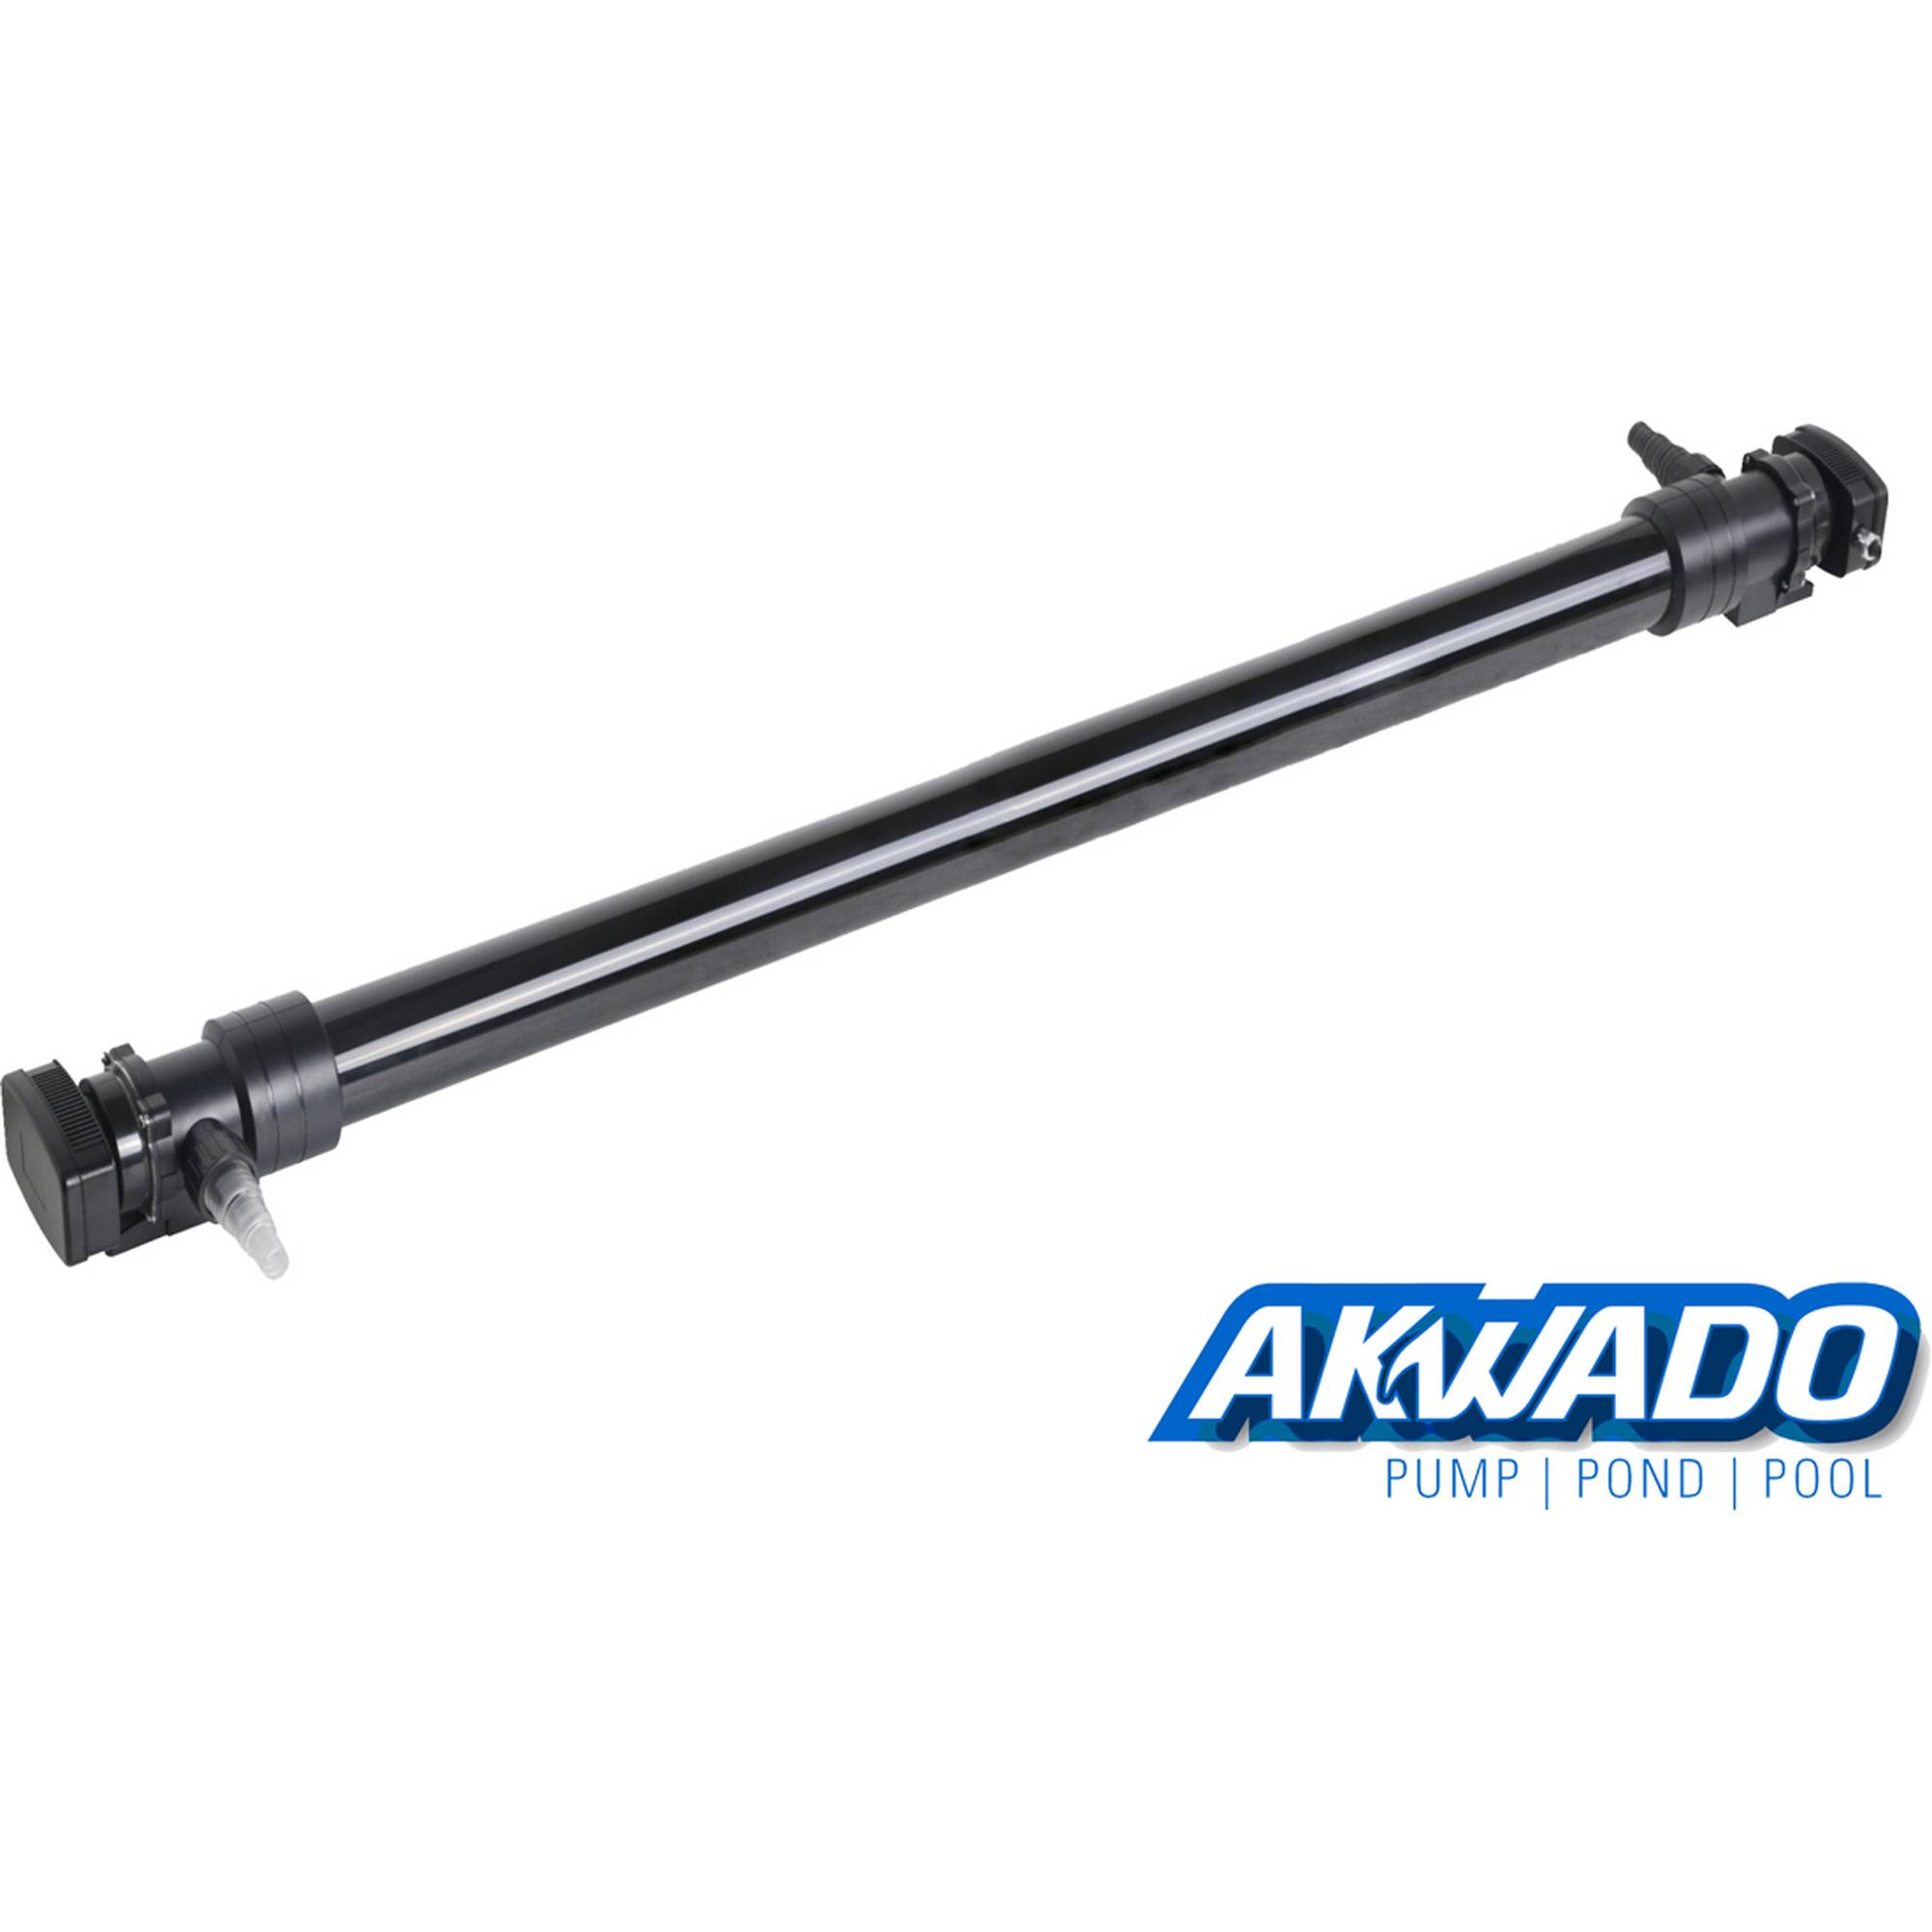 AKWADO CUV-6110 Edelstahl Teichklärer mit 110W